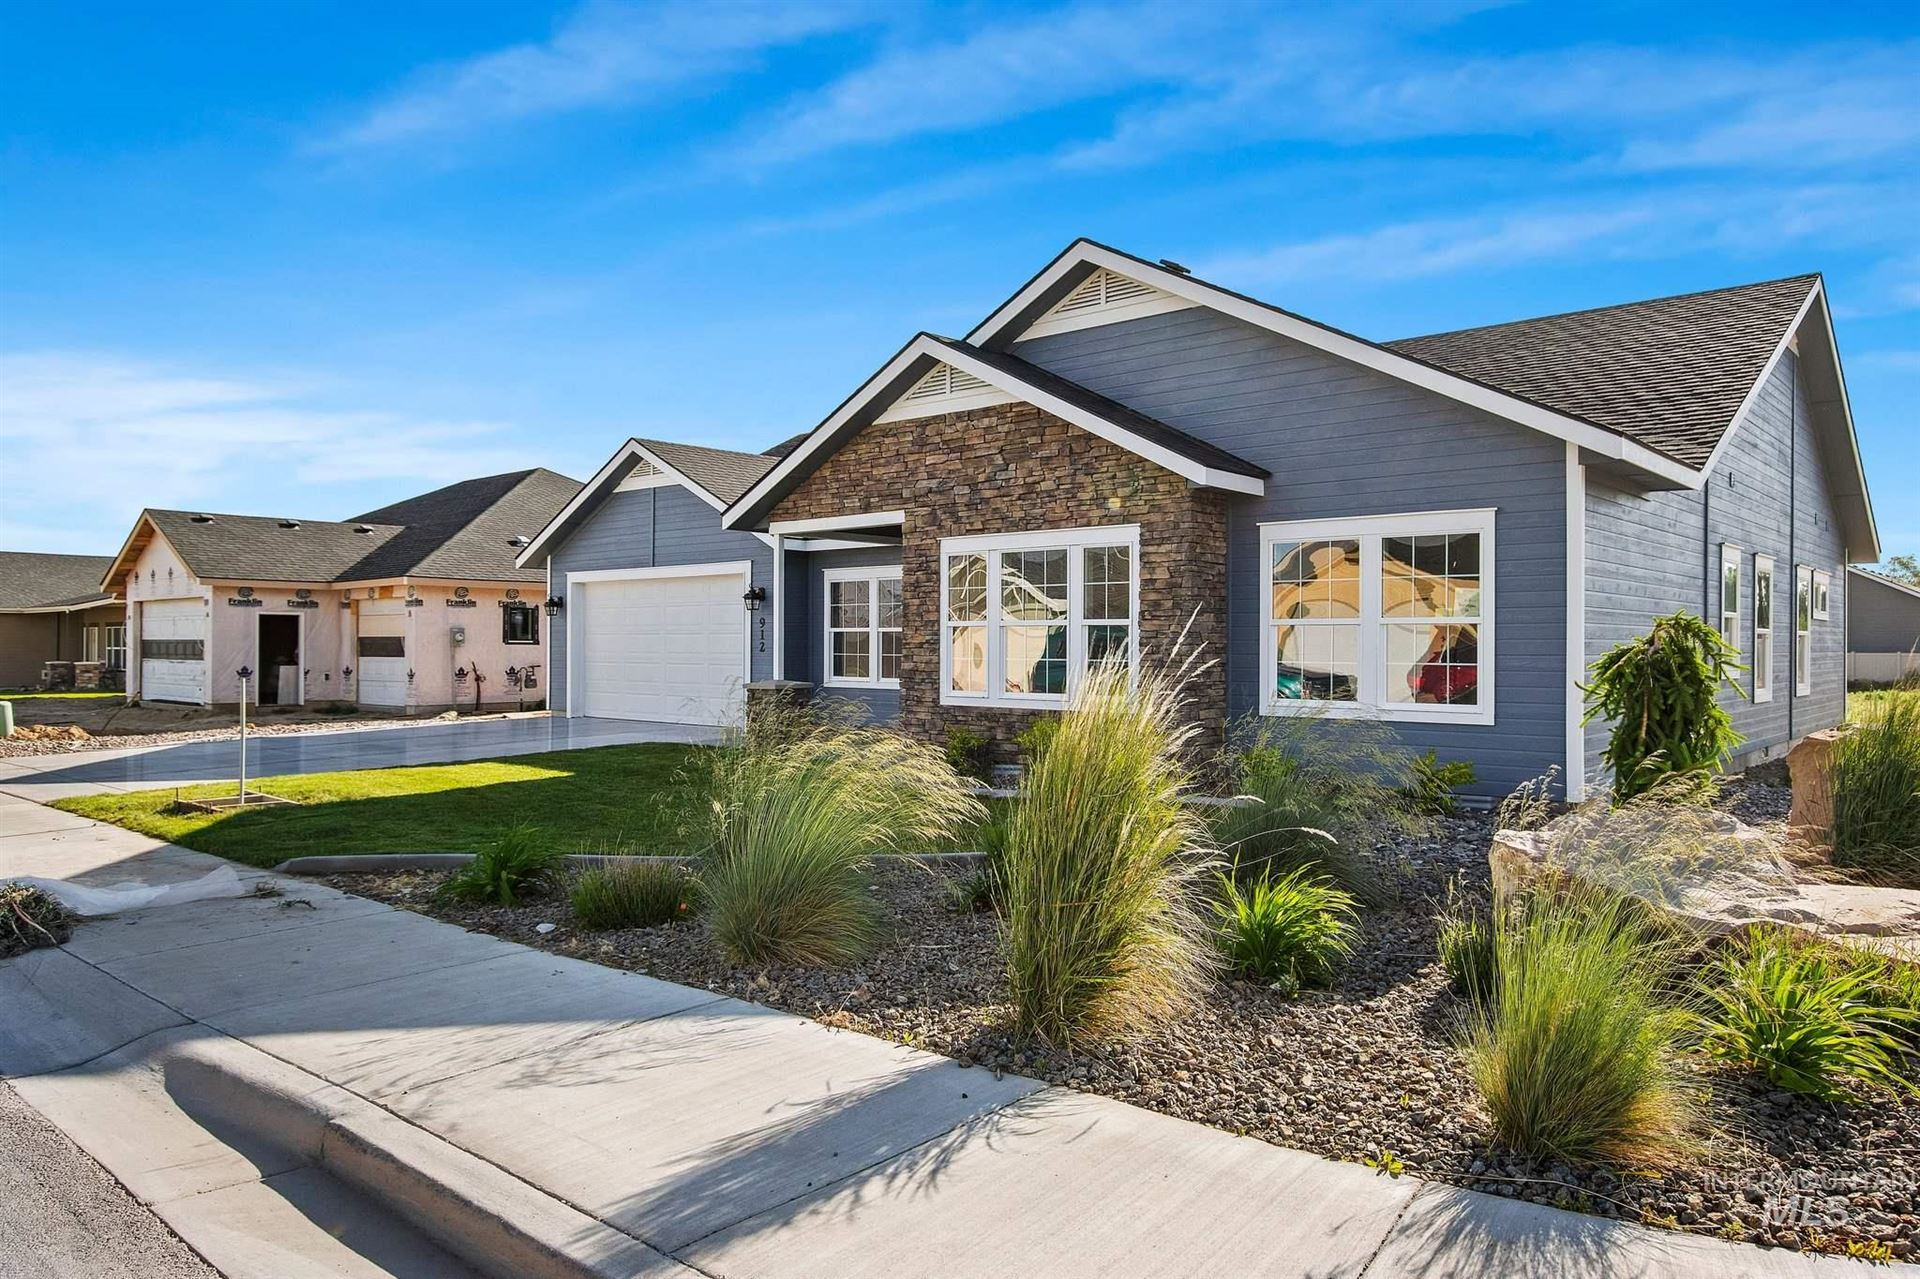 1005 Kenbrook Loop, Twin Falls, ID 83301 - MLS#: 98797085